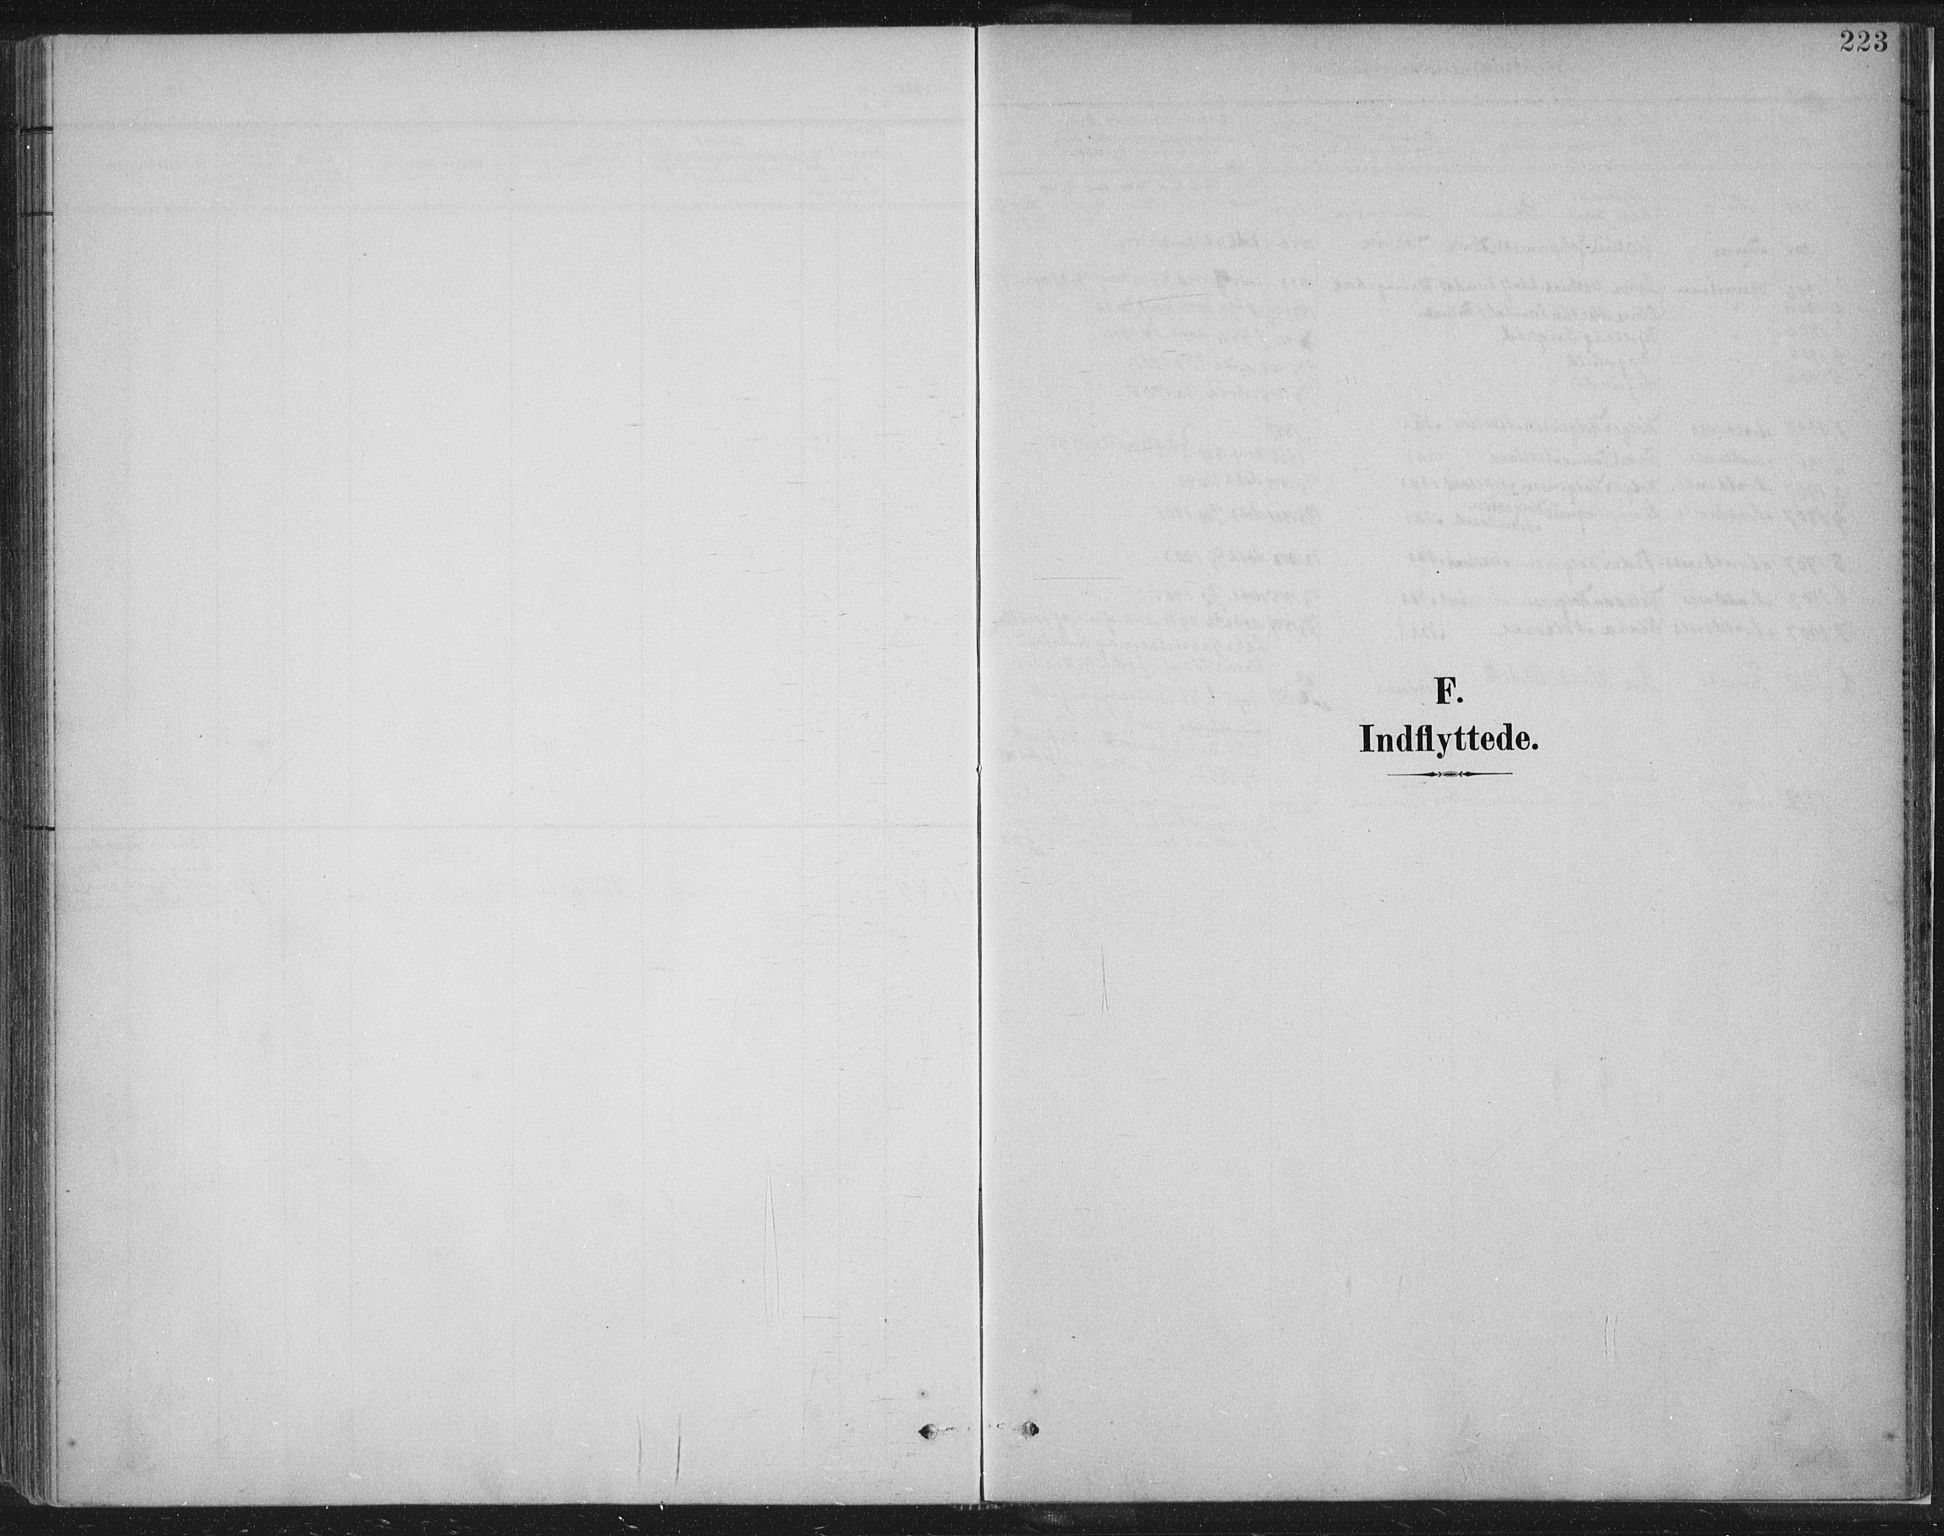 SAST, Tysvær sokneprestkontor, H/Ha/Haa/L0008: Ministerialbok nr. A 8, 1897-1918, s. 223